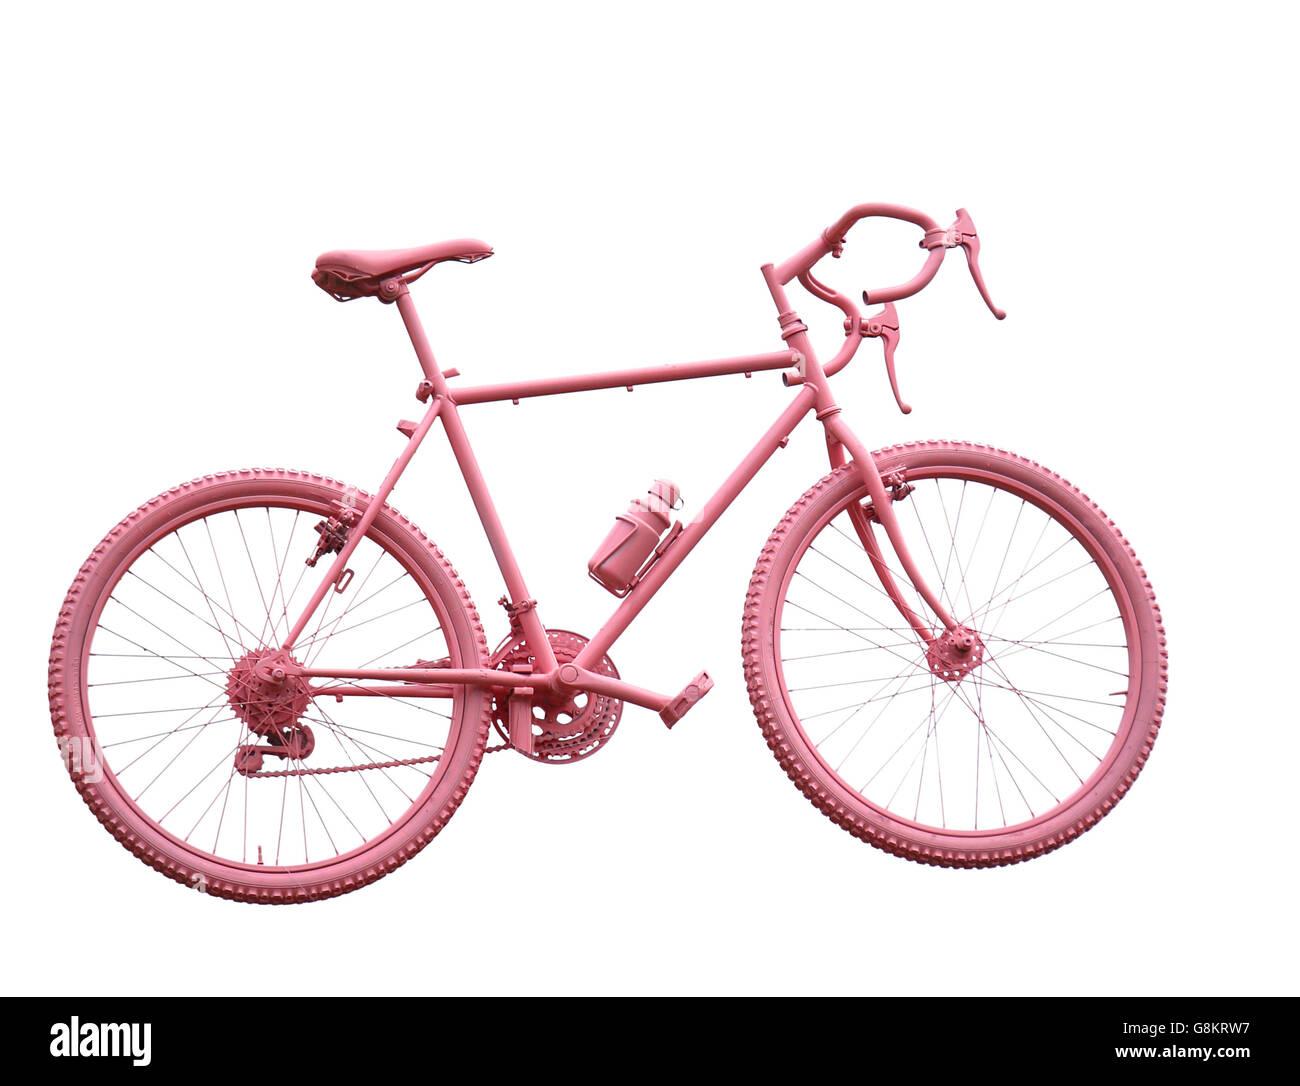 Moto deportiva todos rosa sobre fondo blanco. Imagen De Stock